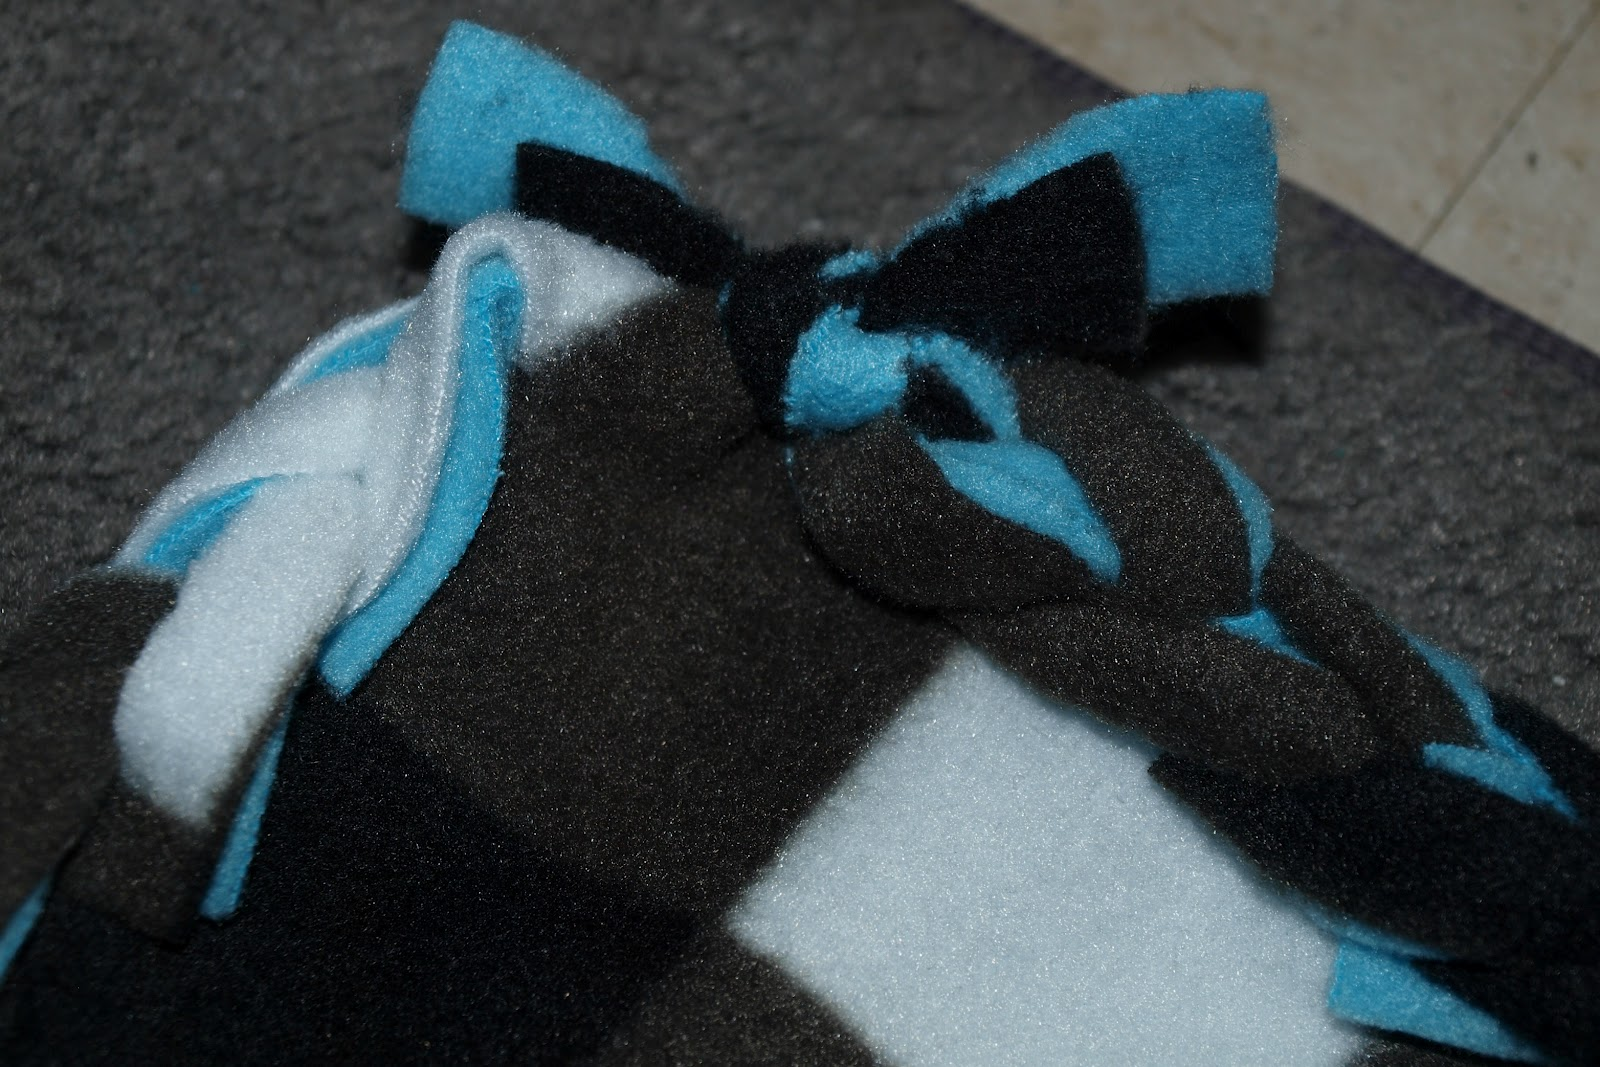 Elemental Carbon: Fleece Blanket with Crocheted Edge // DIY